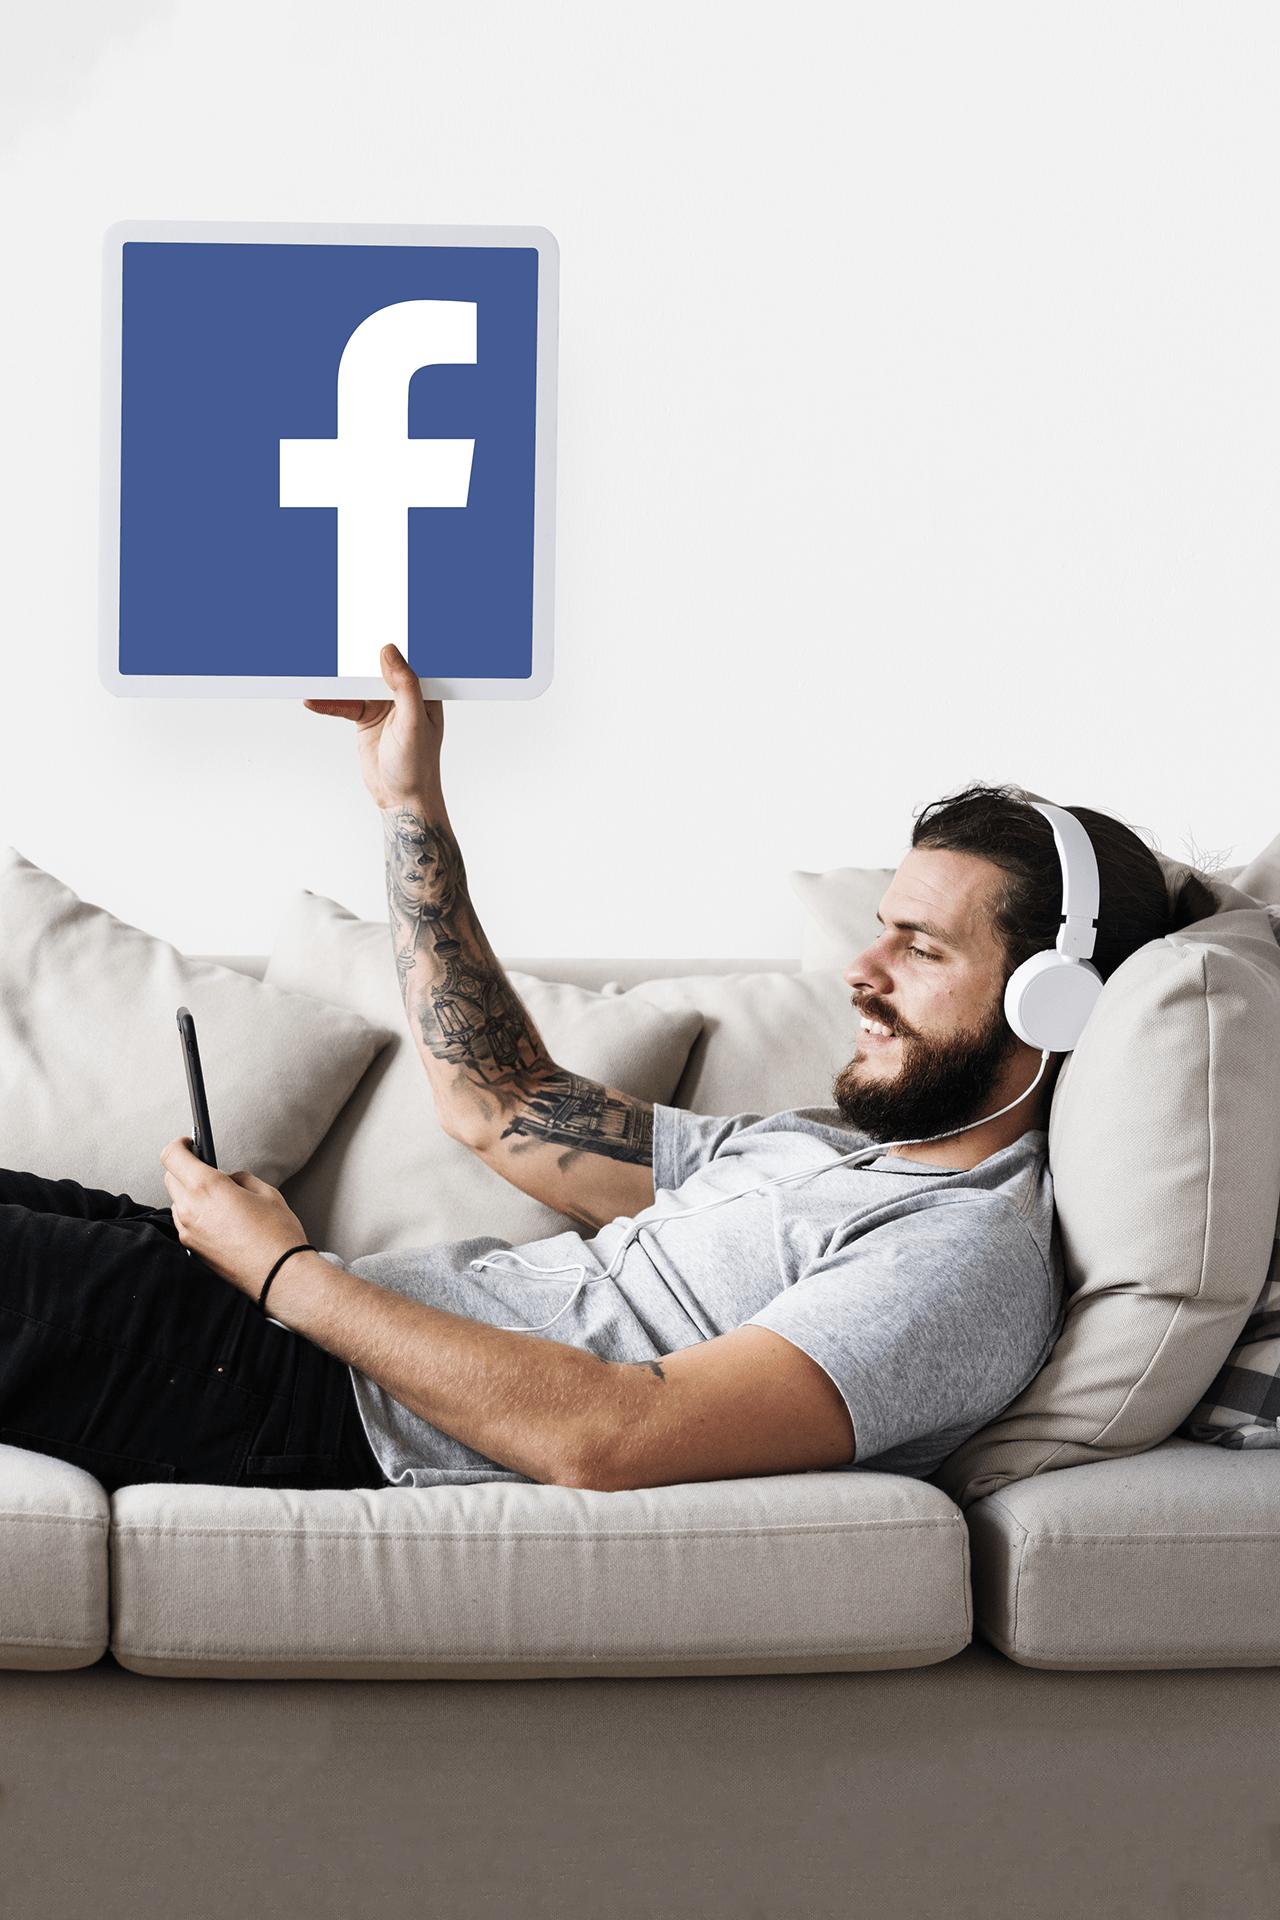 La cura del Feed delle notizie di Facebook